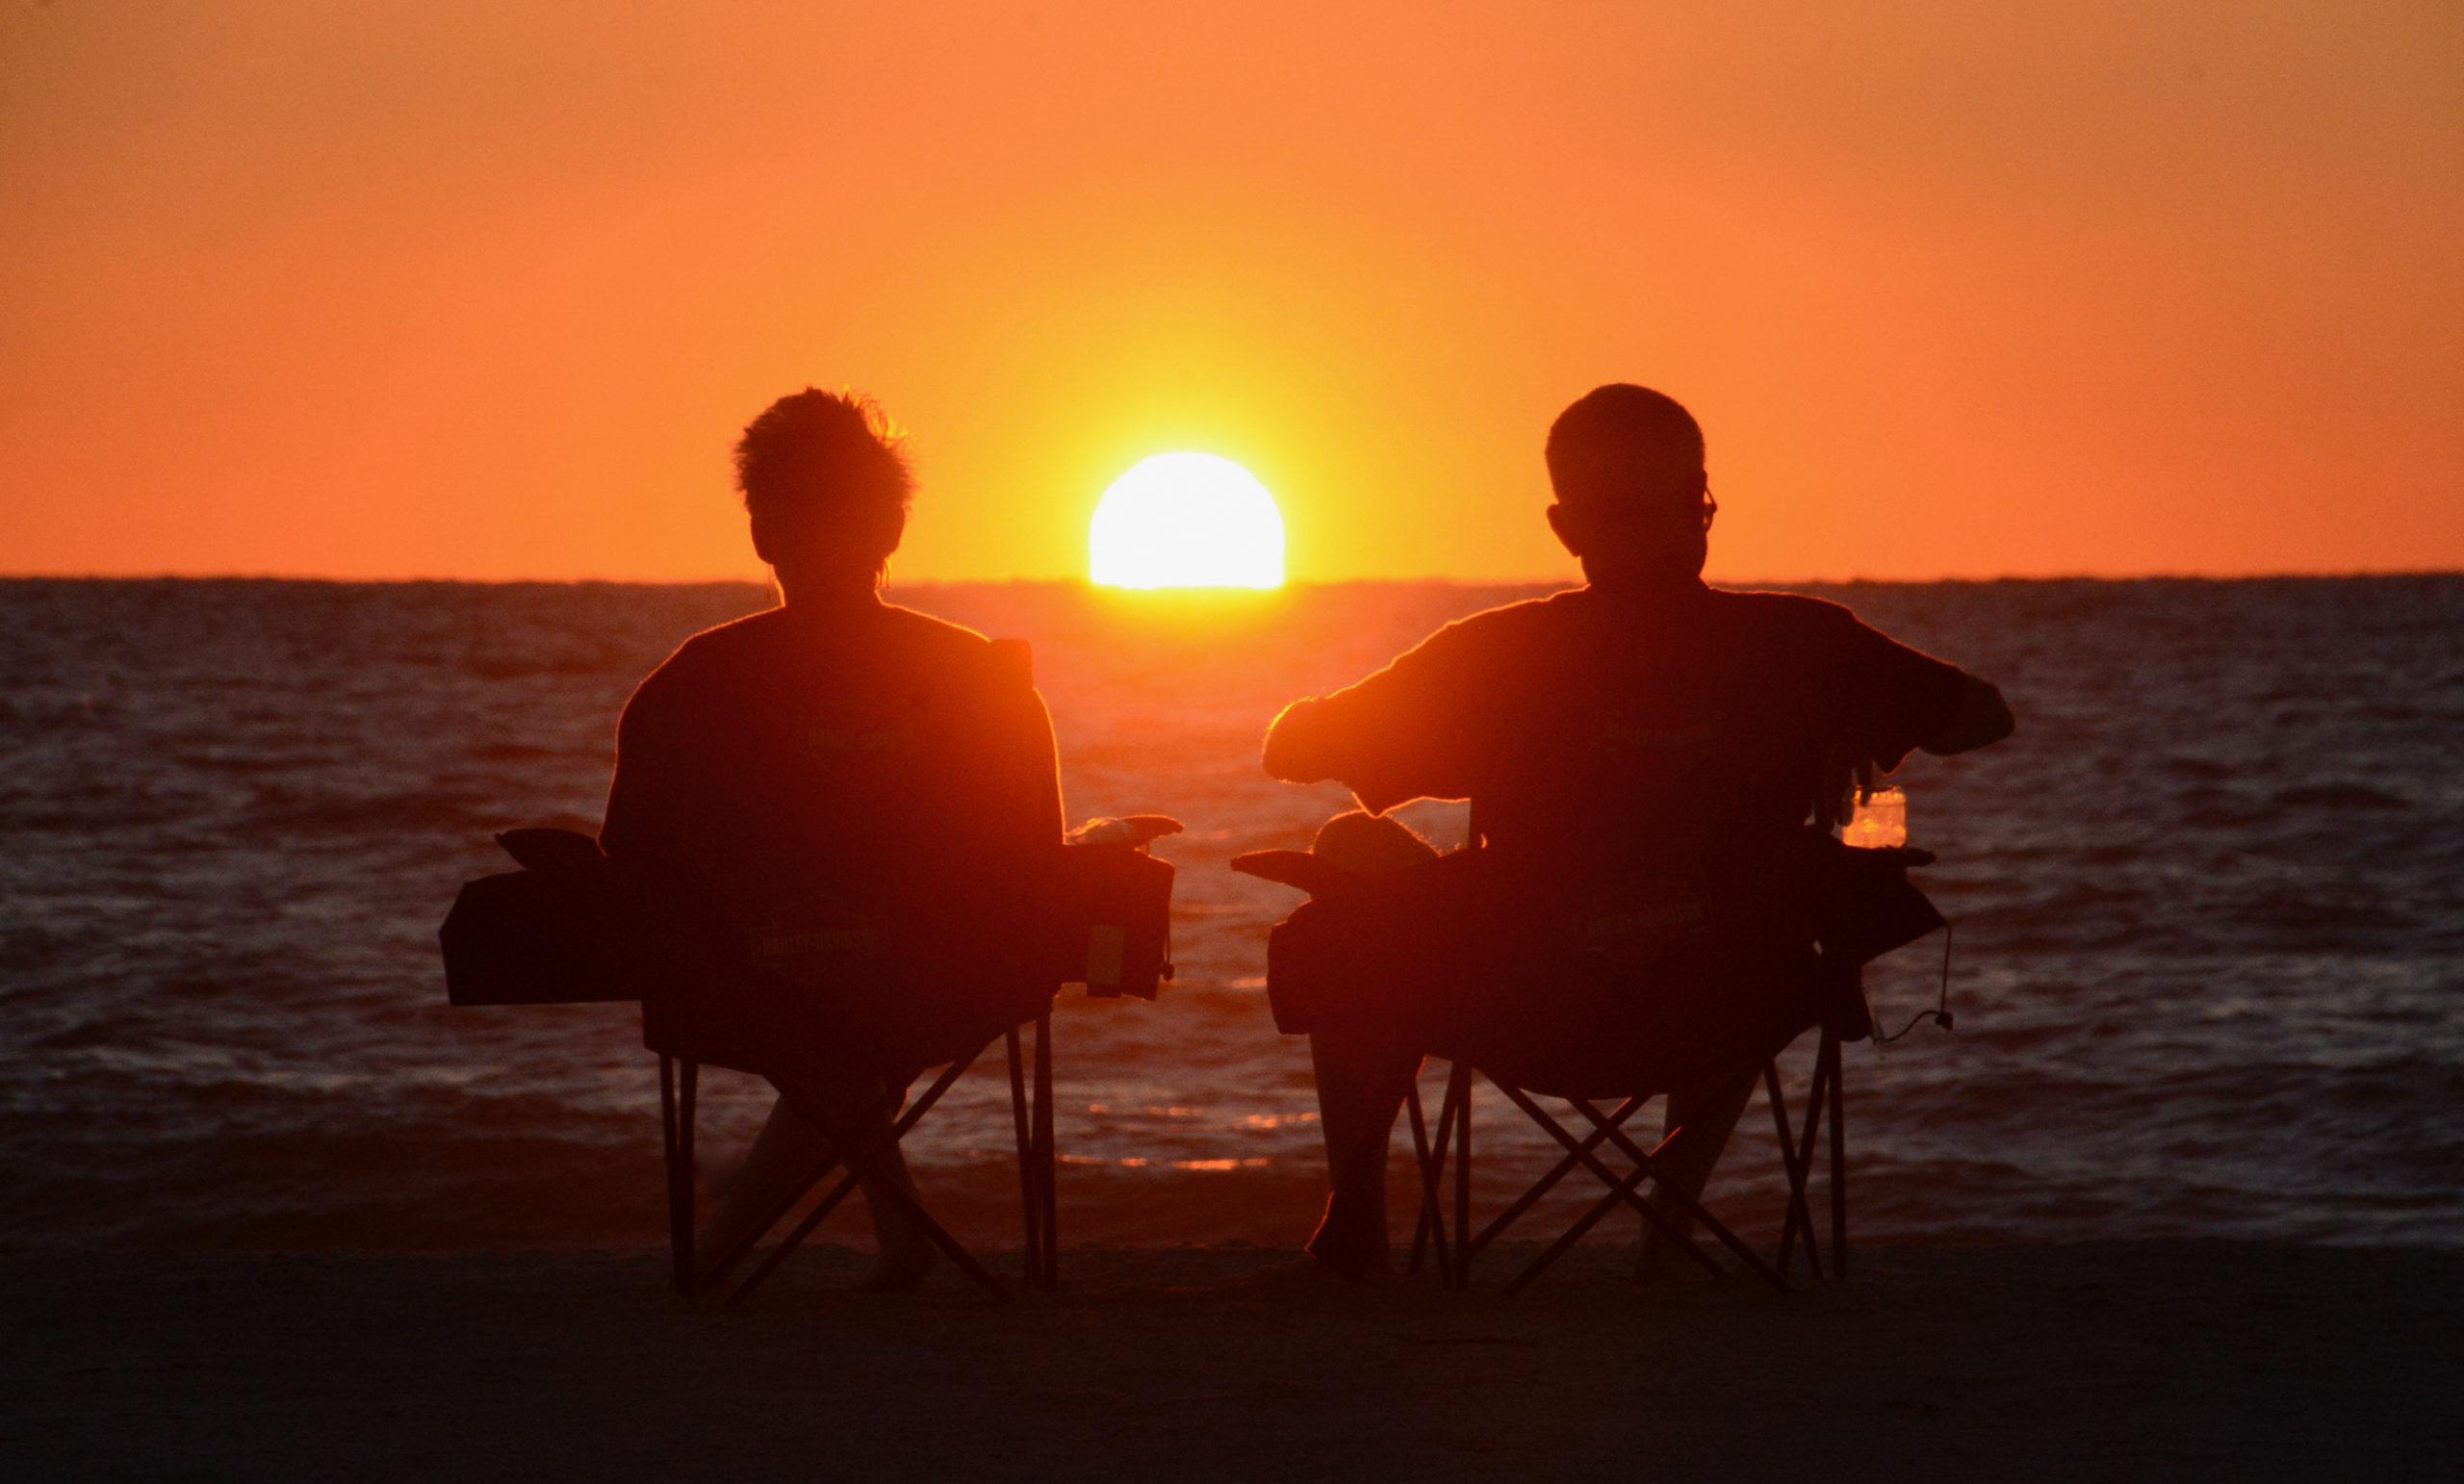 Sonnenuntergang in Anna Maria Island bei Sarasota, Florida